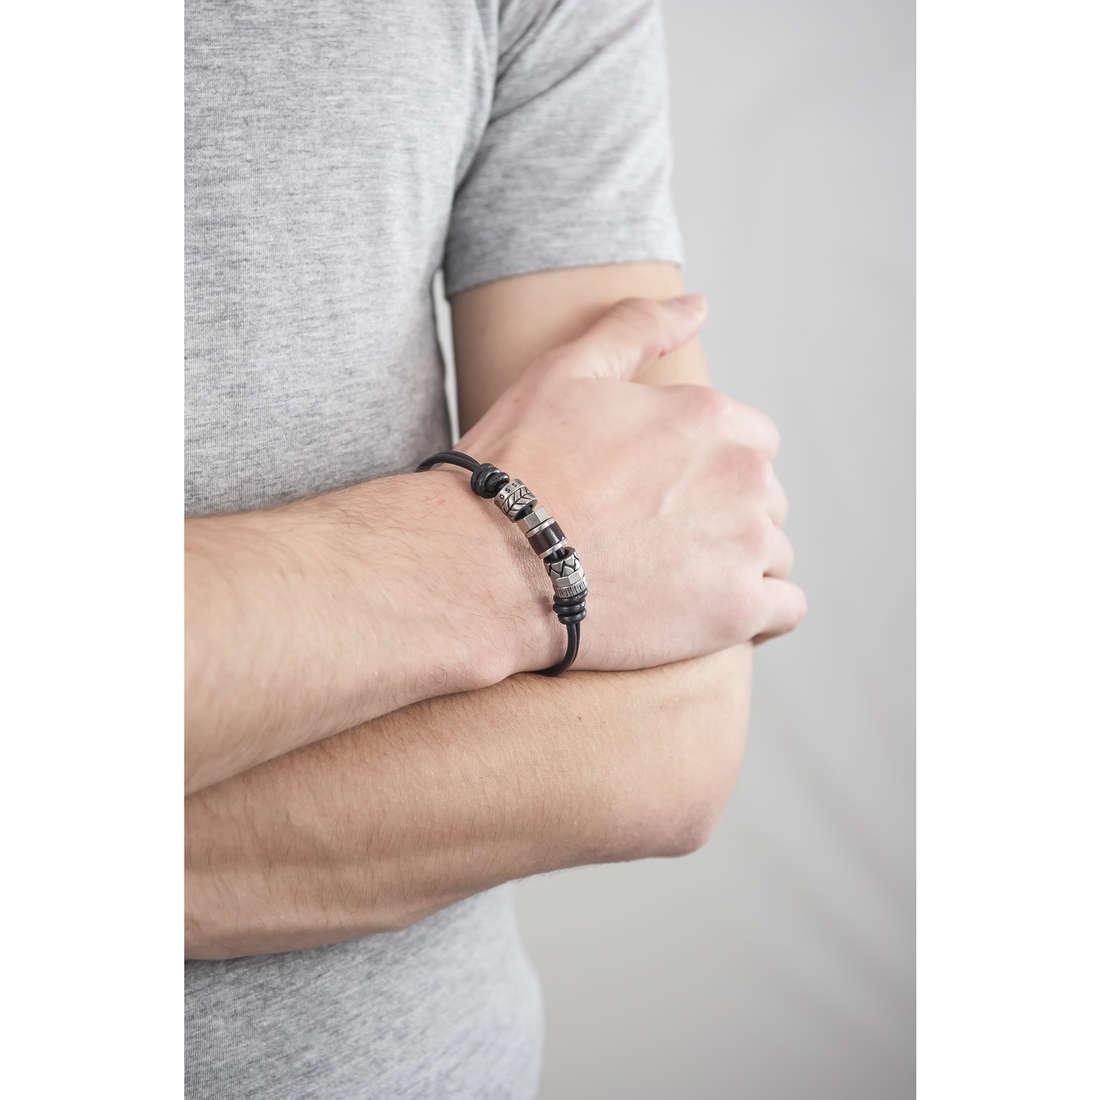 Fossil bracciali Spring 09 uomo JF84196040 indosso